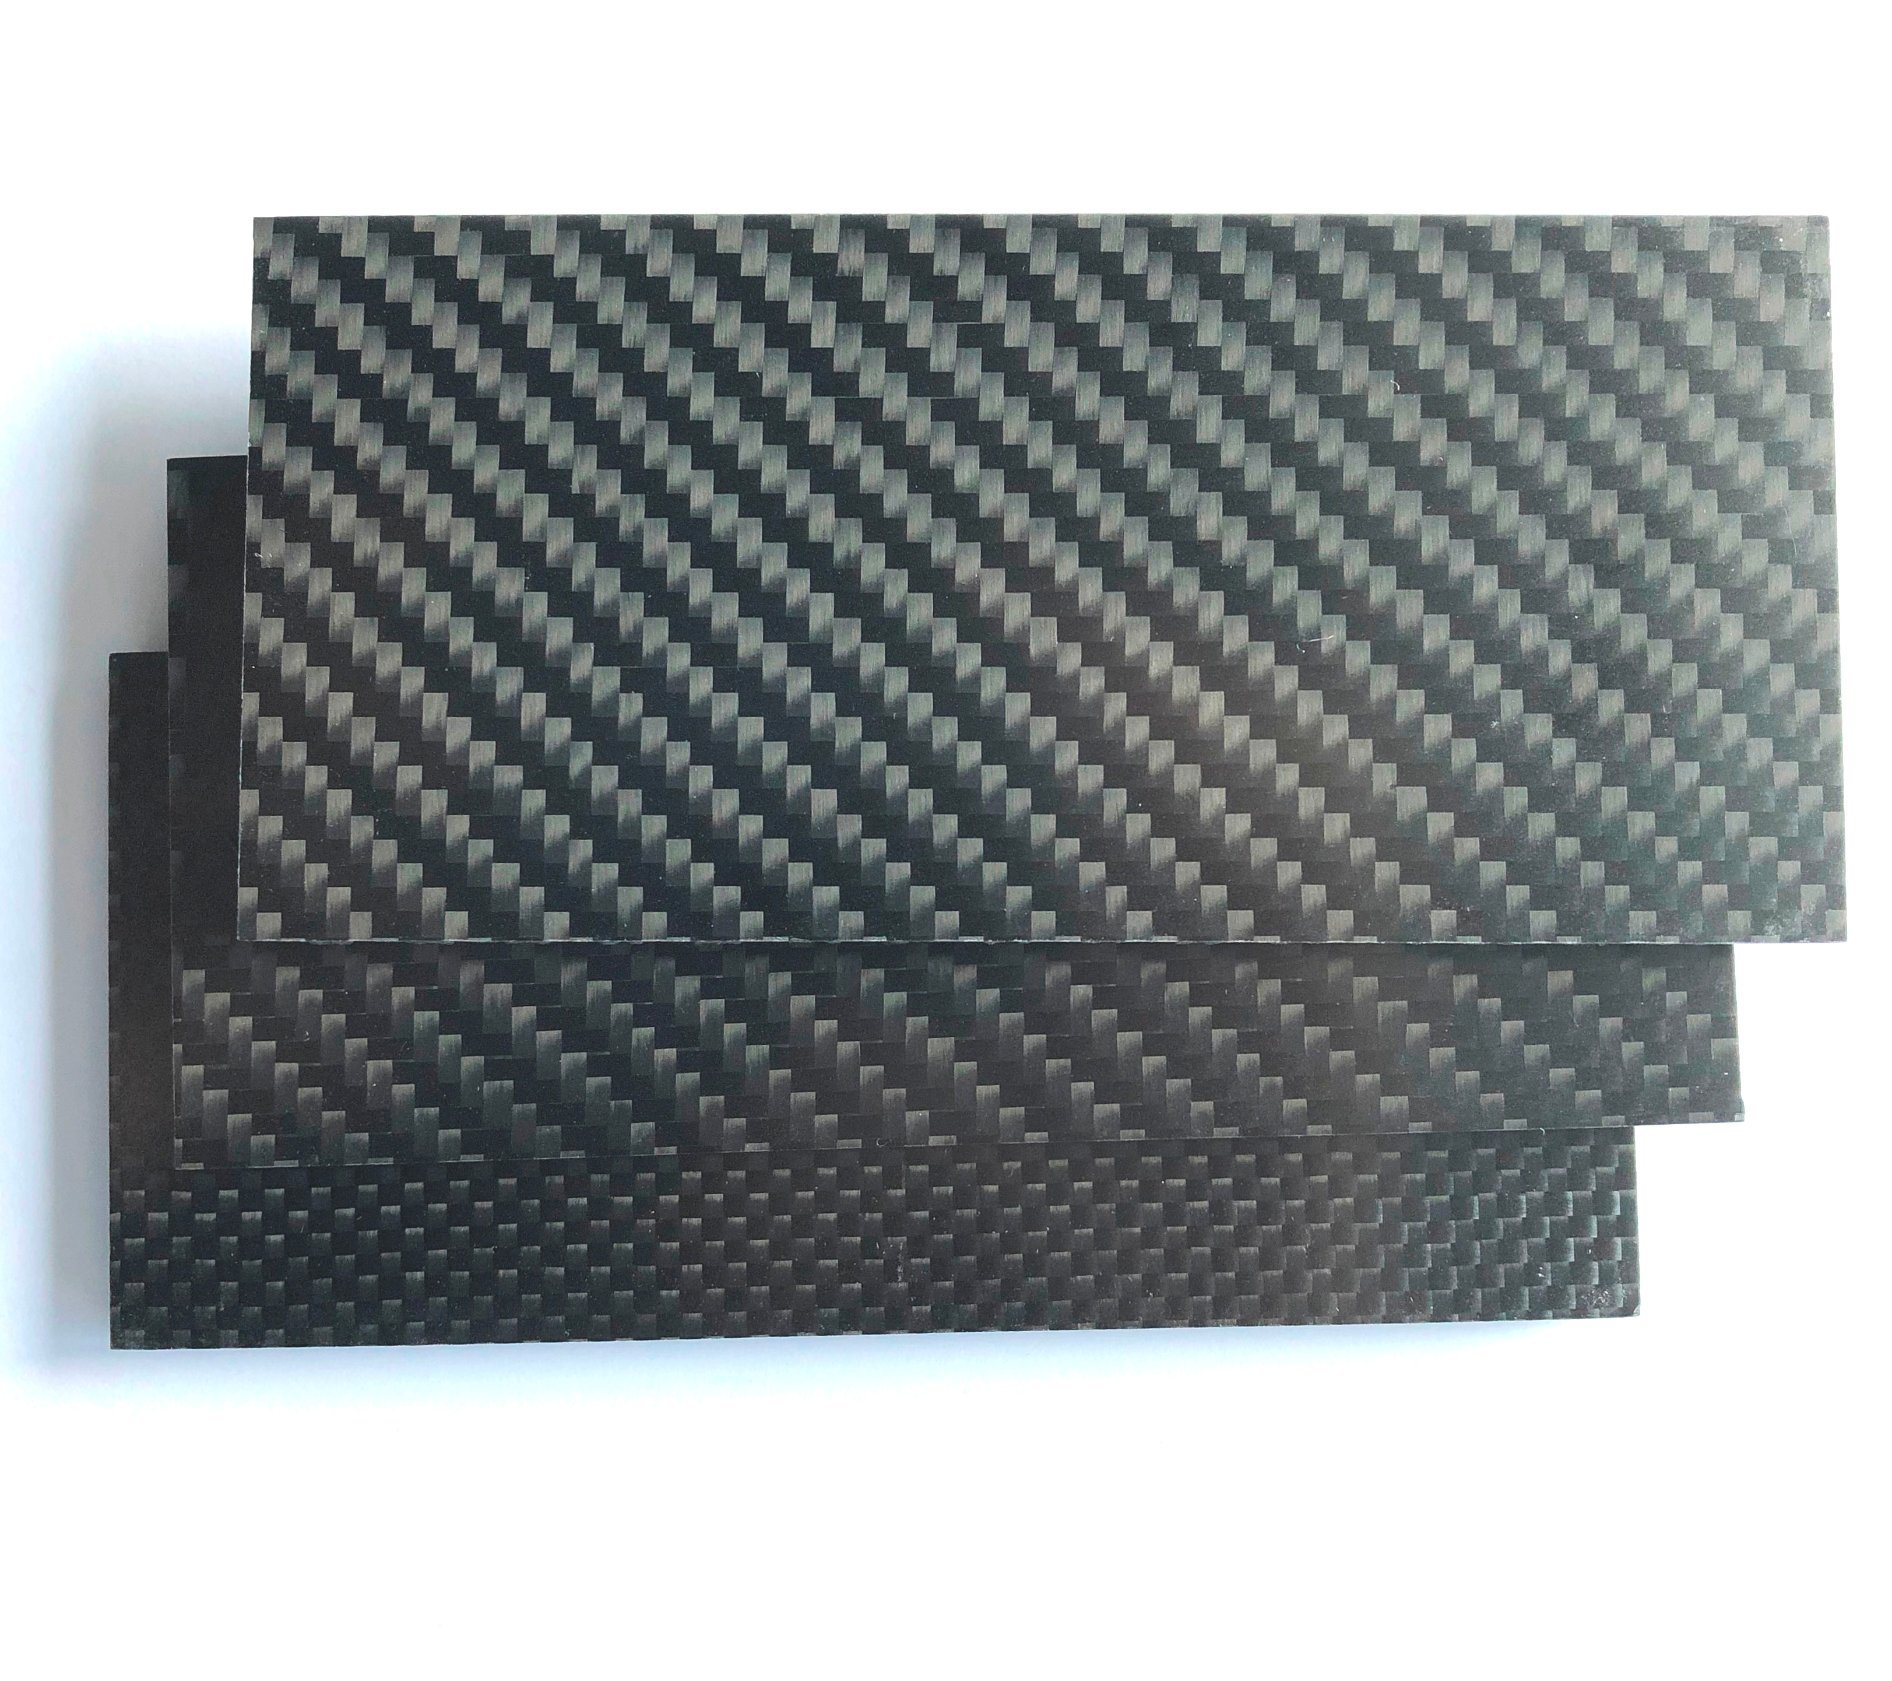 [Hot Item] High Quality 2mm/3mm/4mm/5mm Carbon Fiber Plate 3K Carbon Fiber  Sheet/Board